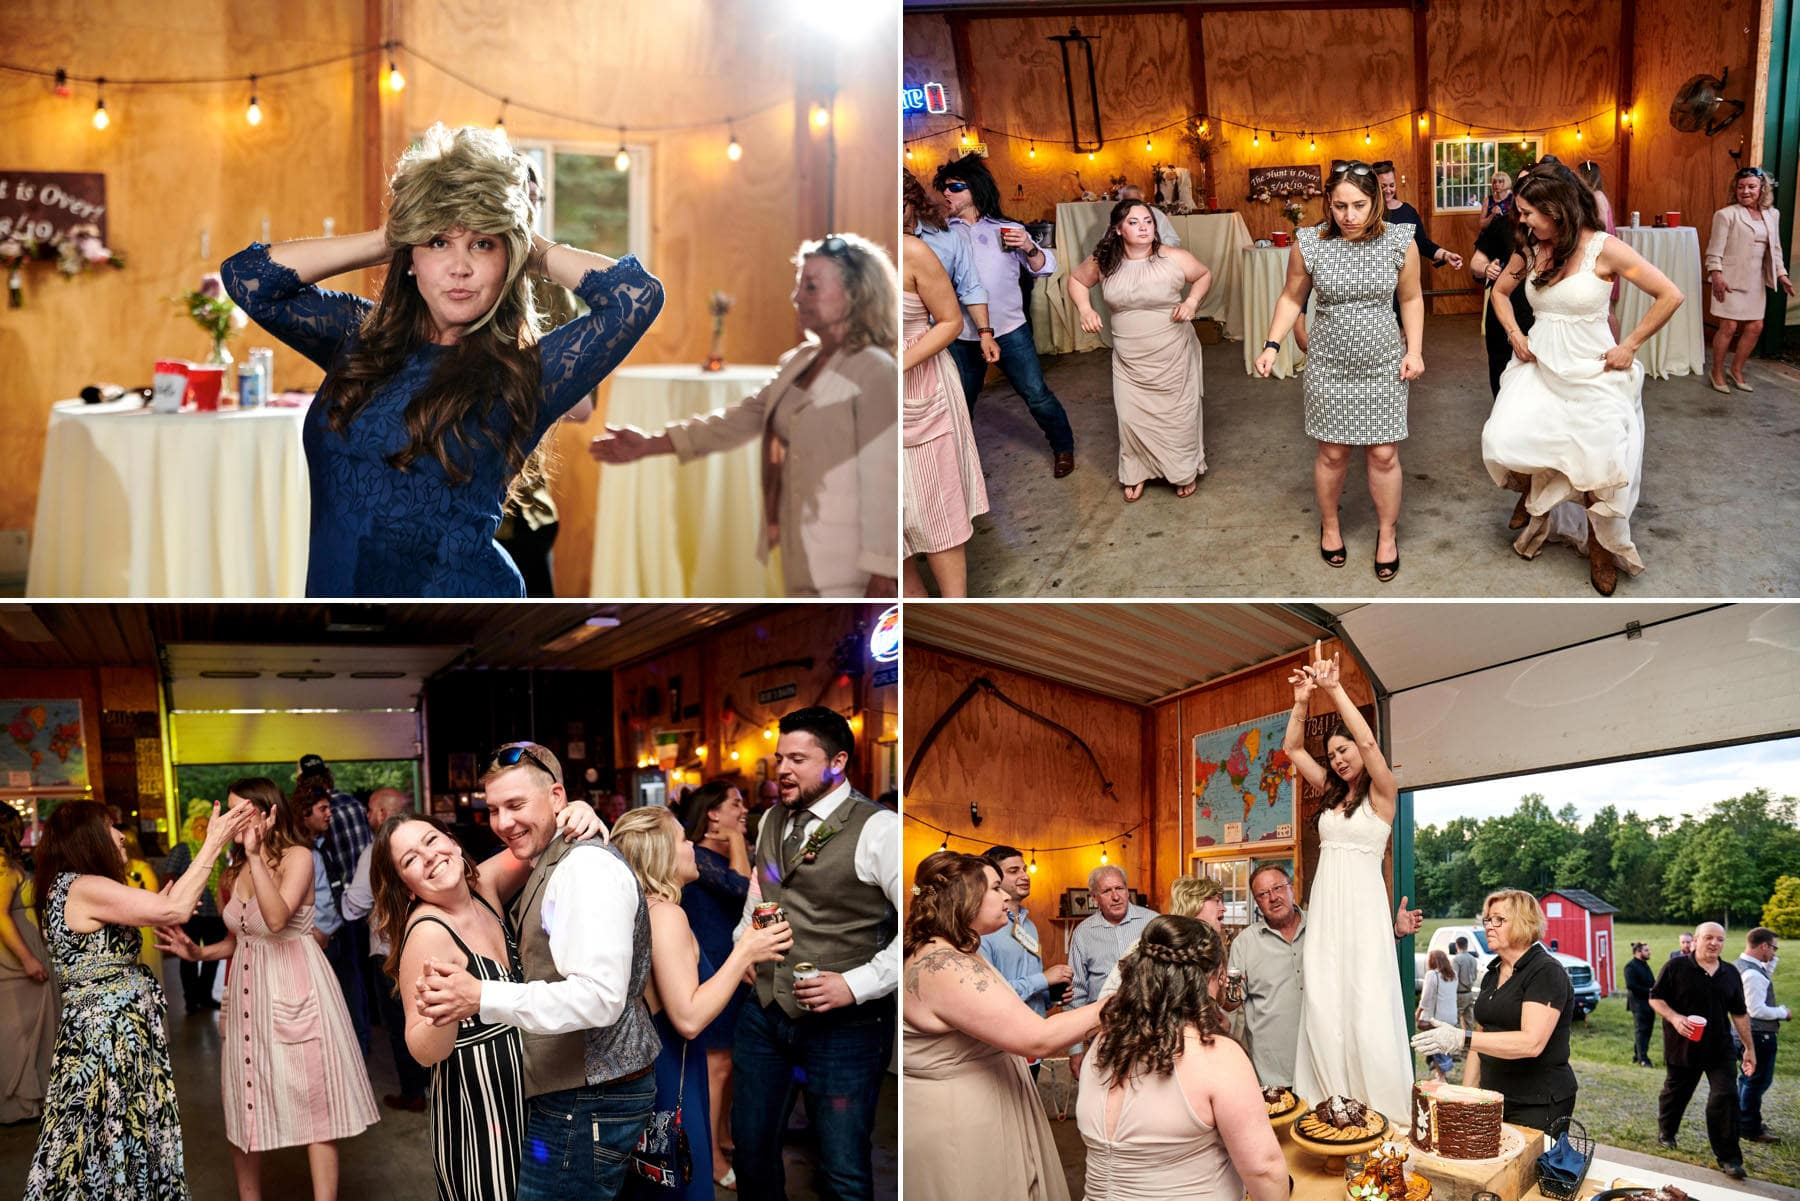 dancefloor photos at farm wedding